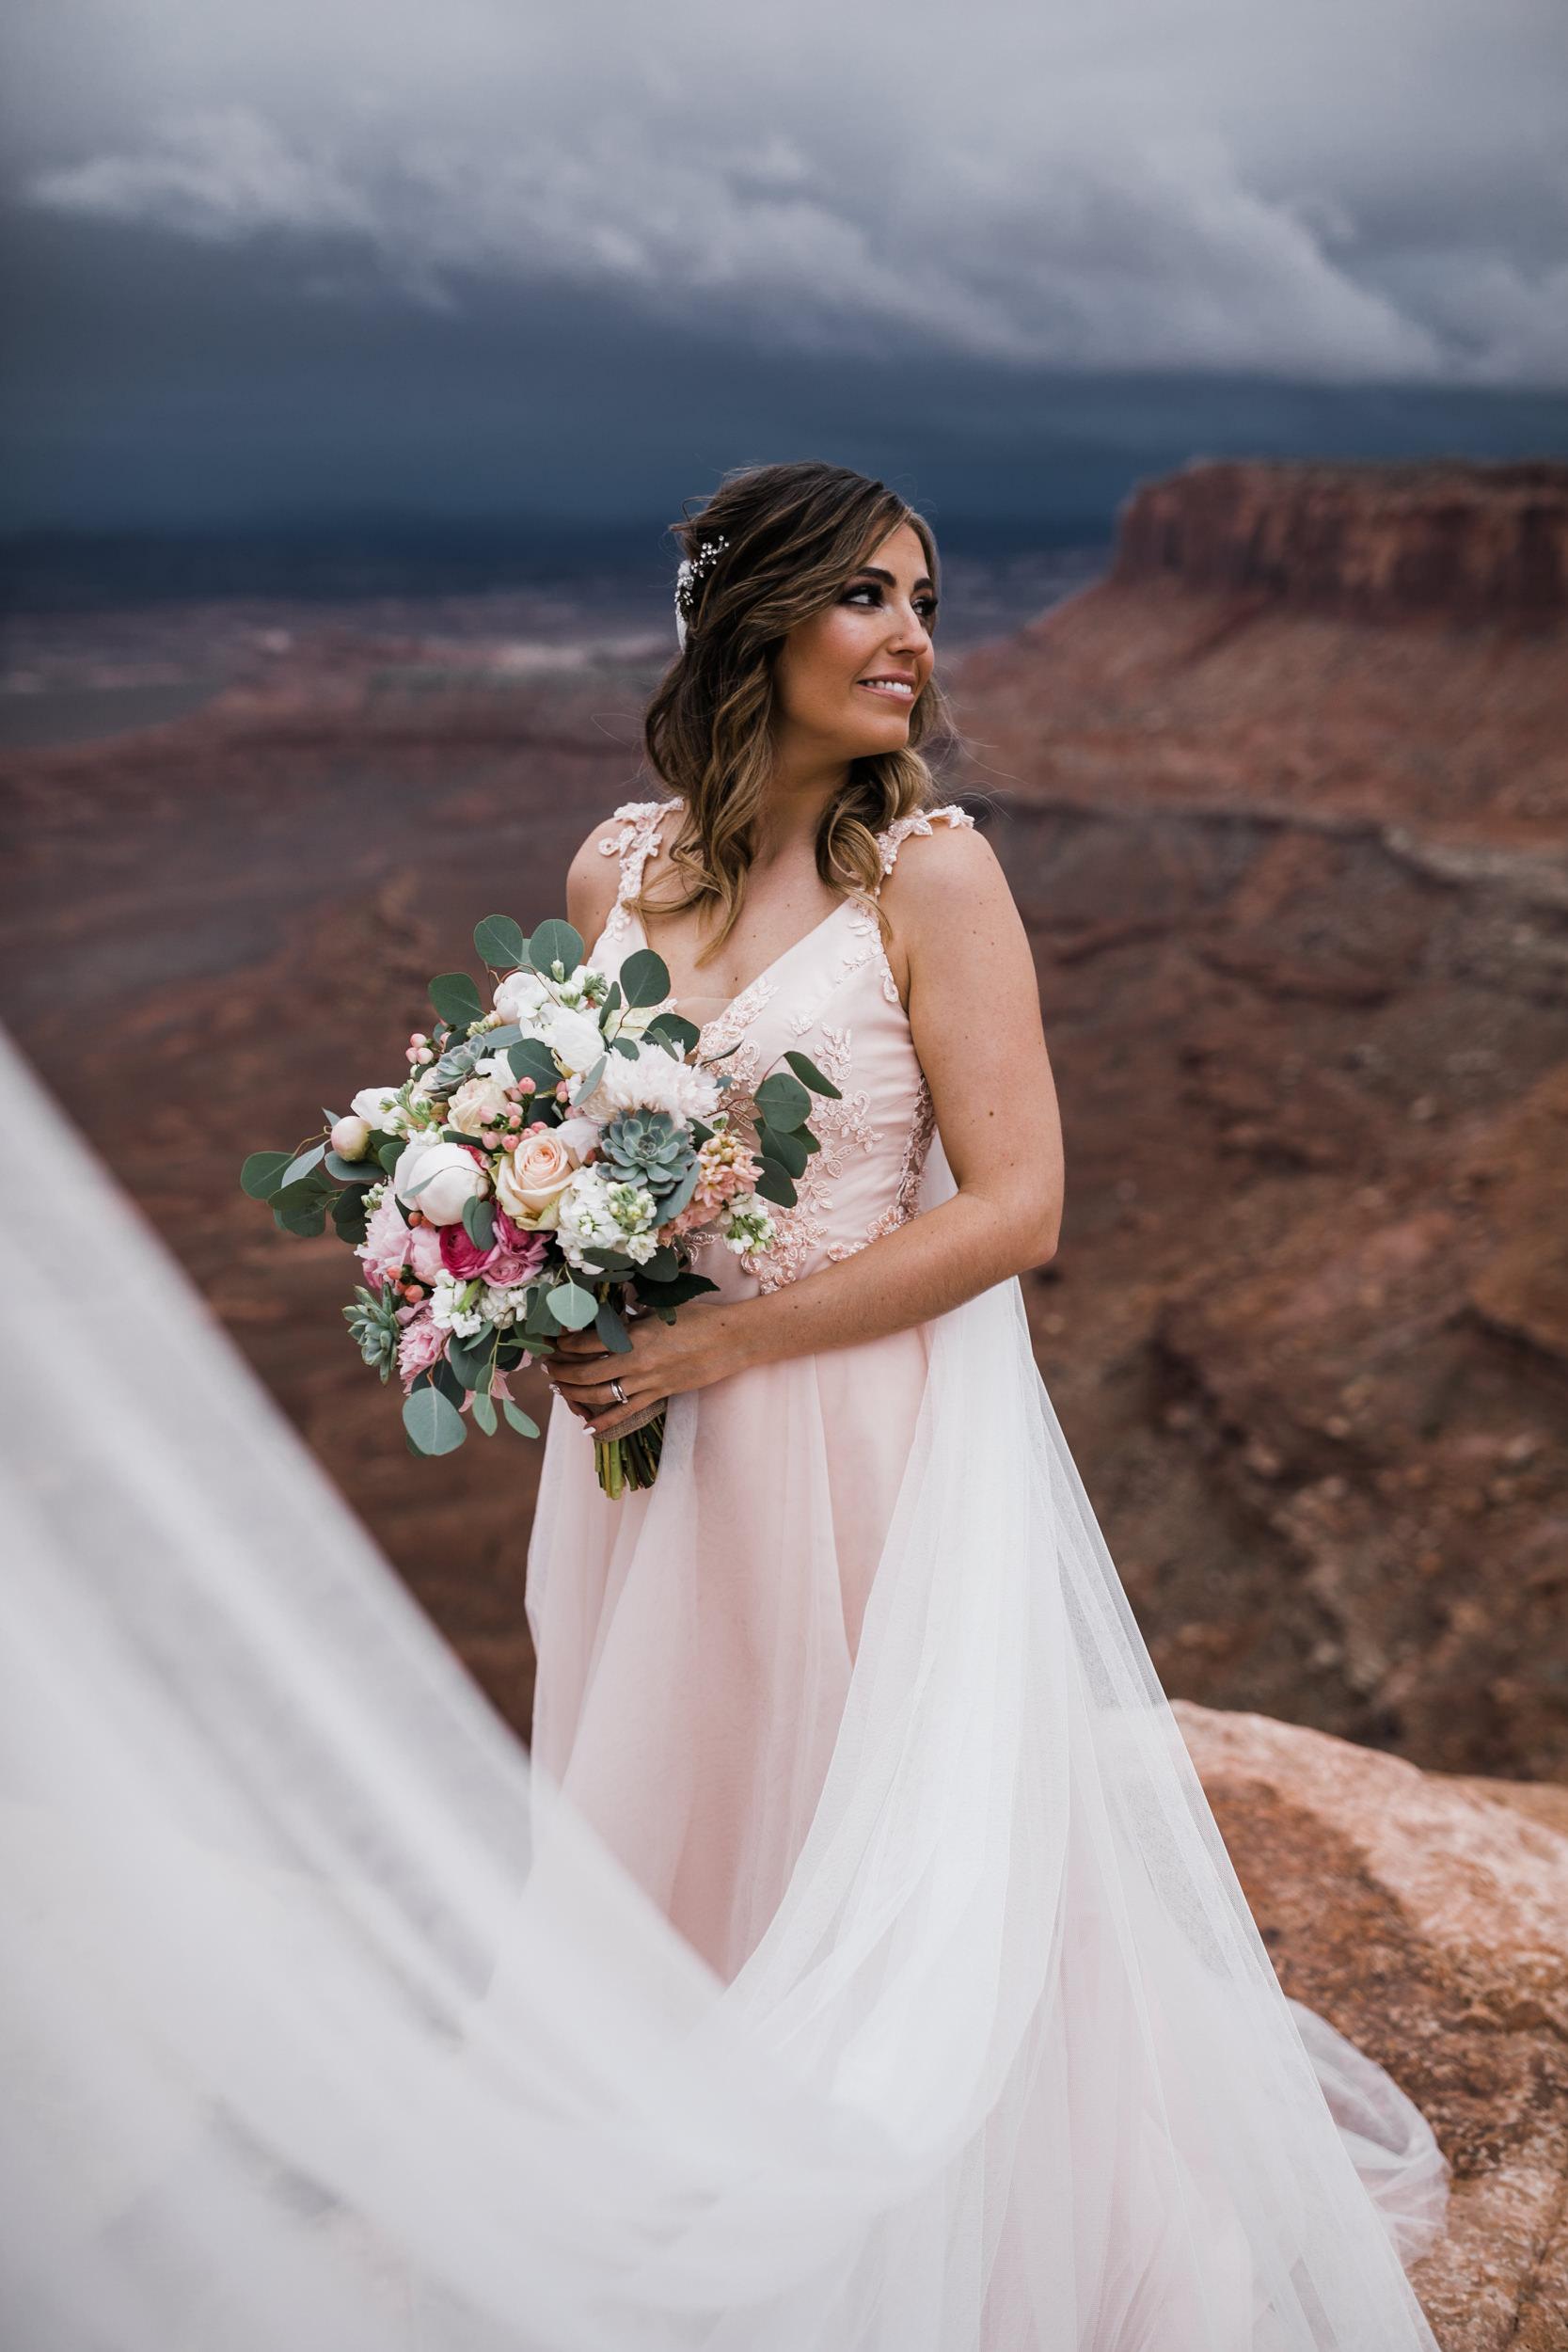 Hearnes-Elopement-Photography-Canyonlands-National-Park-Moab-Wedding-26.jpg